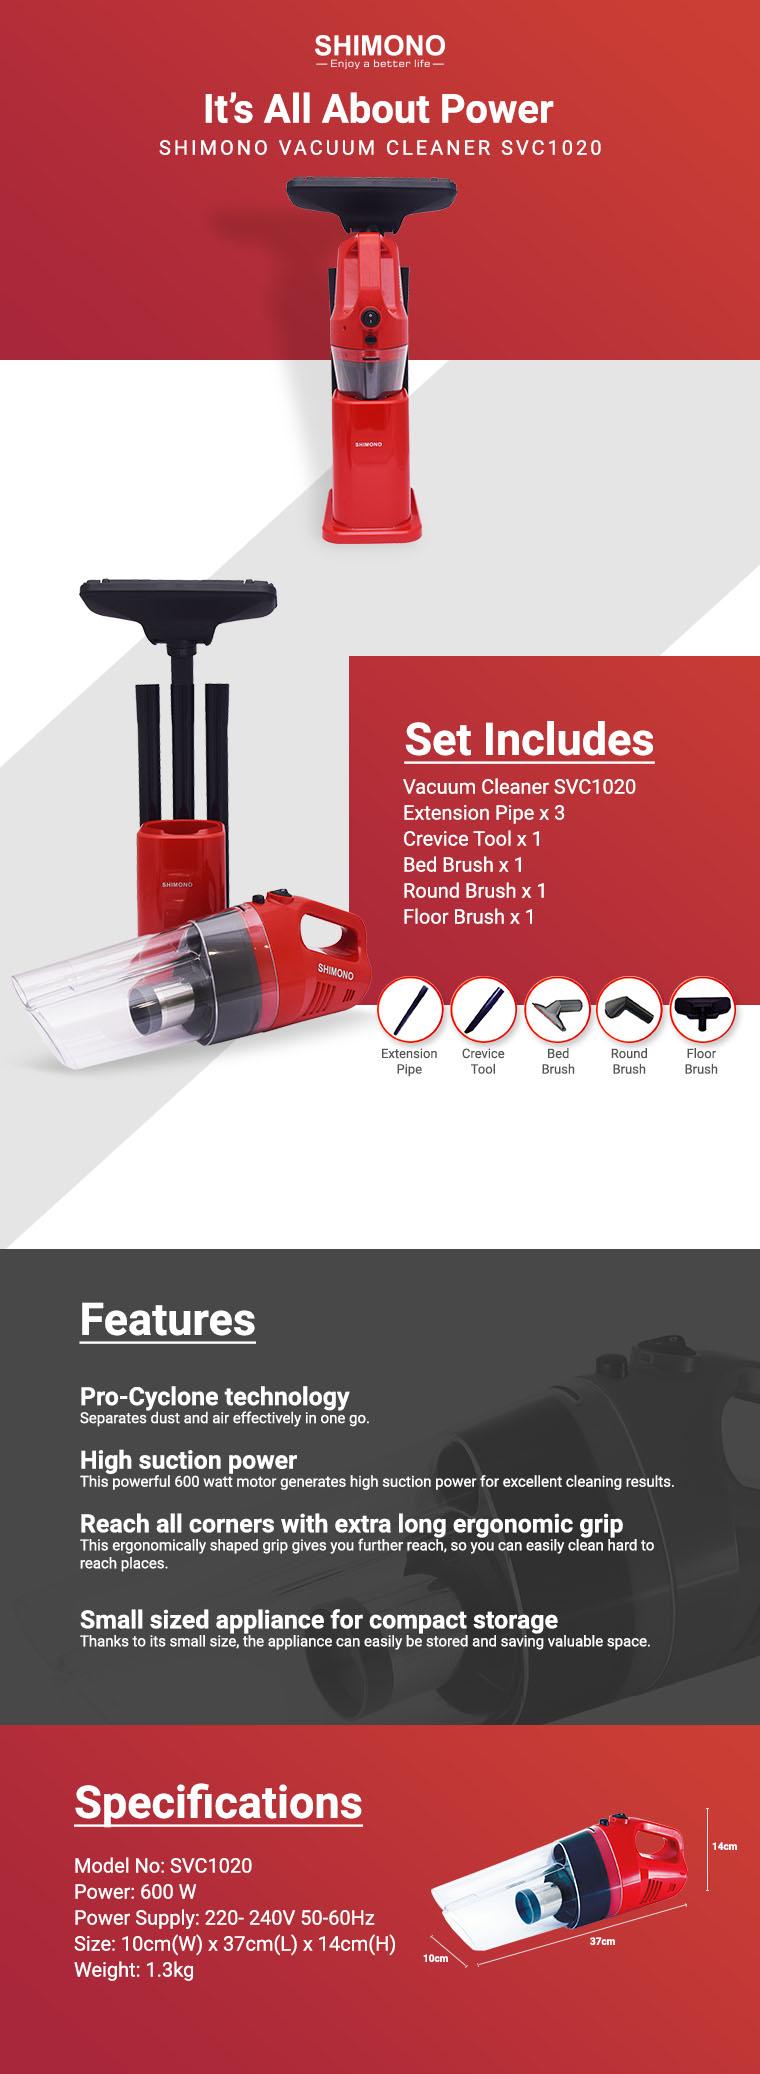 shimono vacuum cleaner svc1020